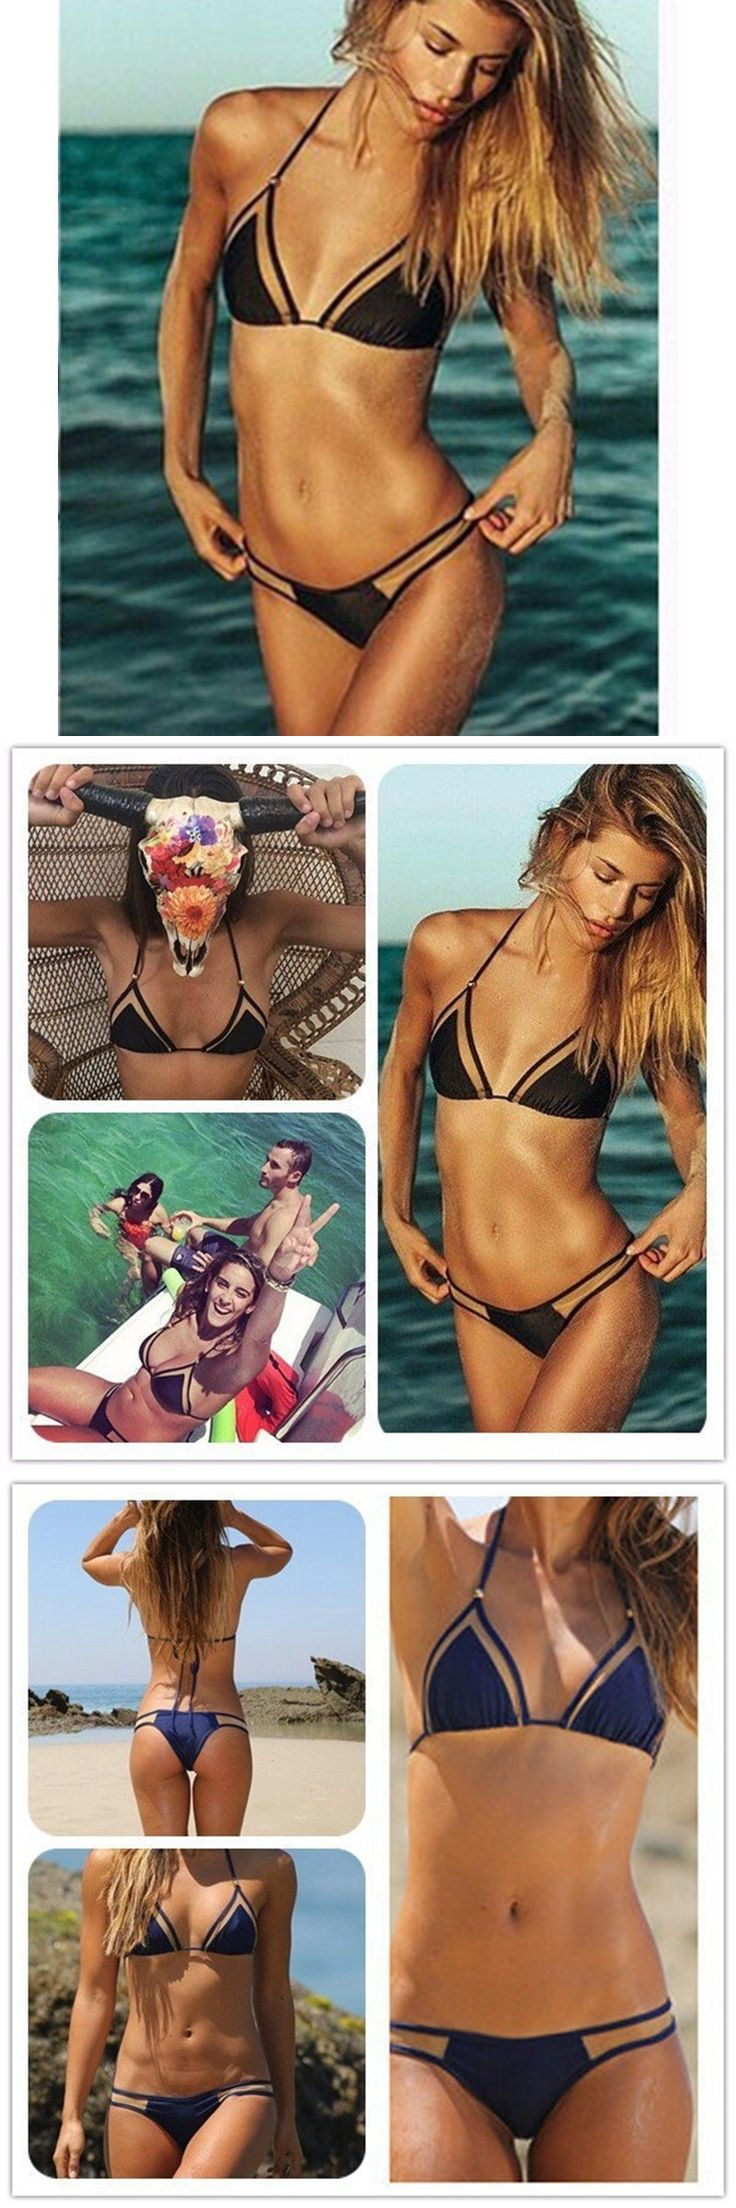 2017 summer brazilian plus size string bikini triangle bikini set sexy  bandage push up swimsuit beach women's swimwear bikini